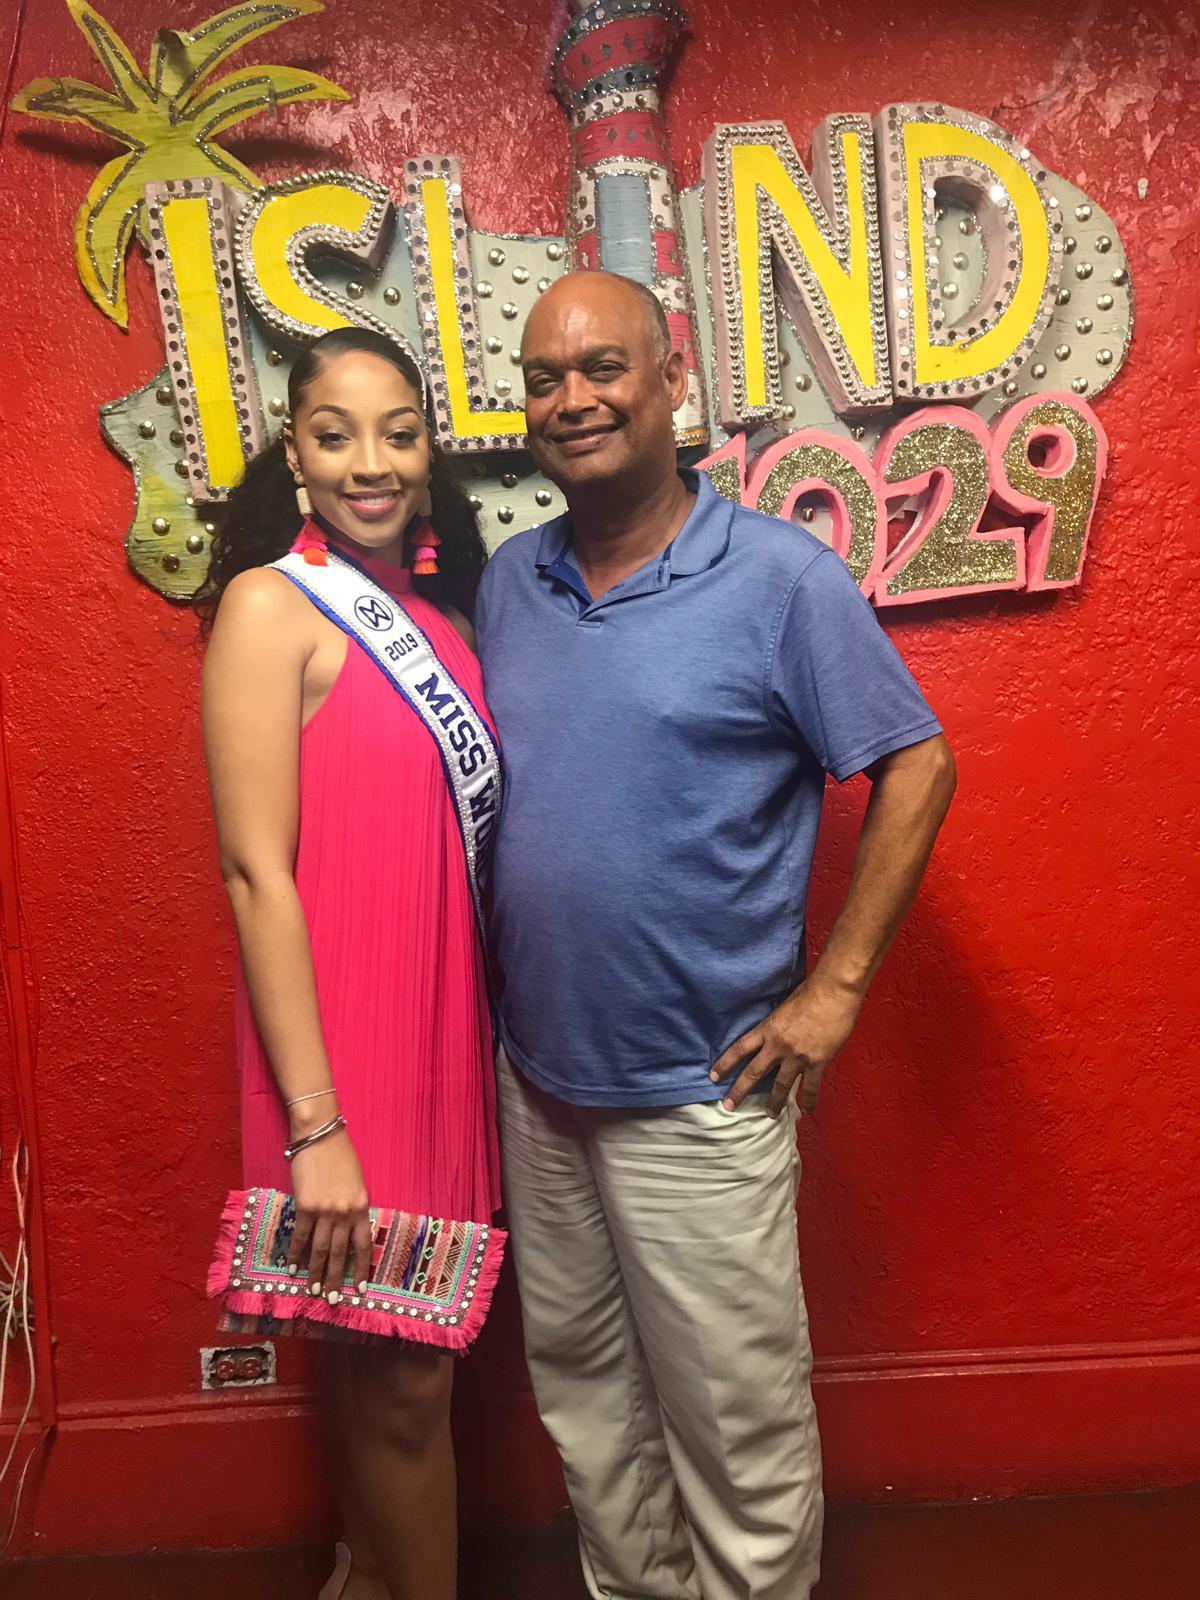 Island FM IMG-20190606-WA0014.jpg